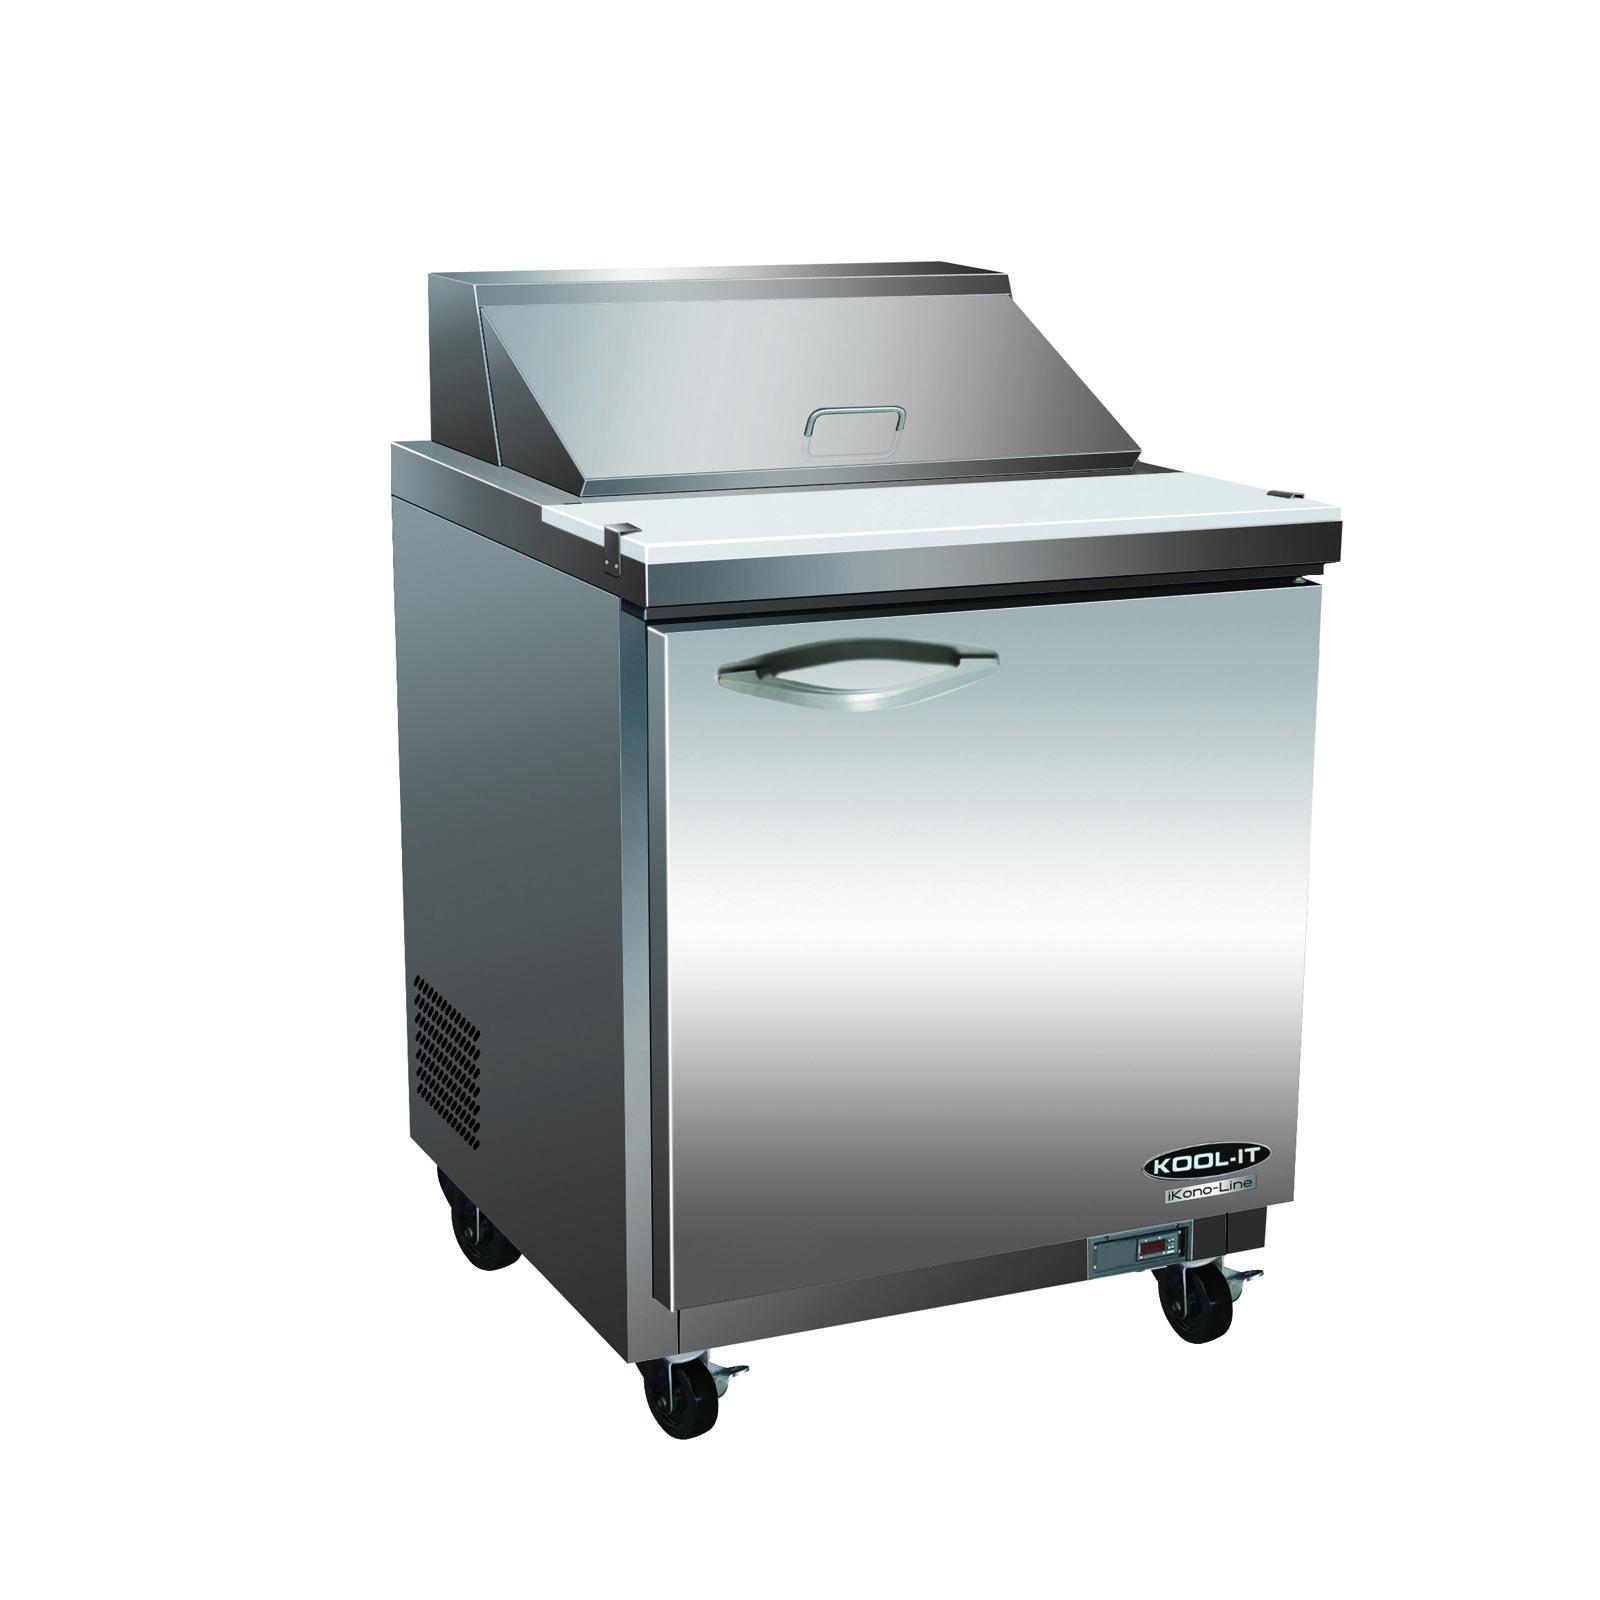 MVP Group LLC ISP29M refrigerated counter, mega top sandwich / salad unit